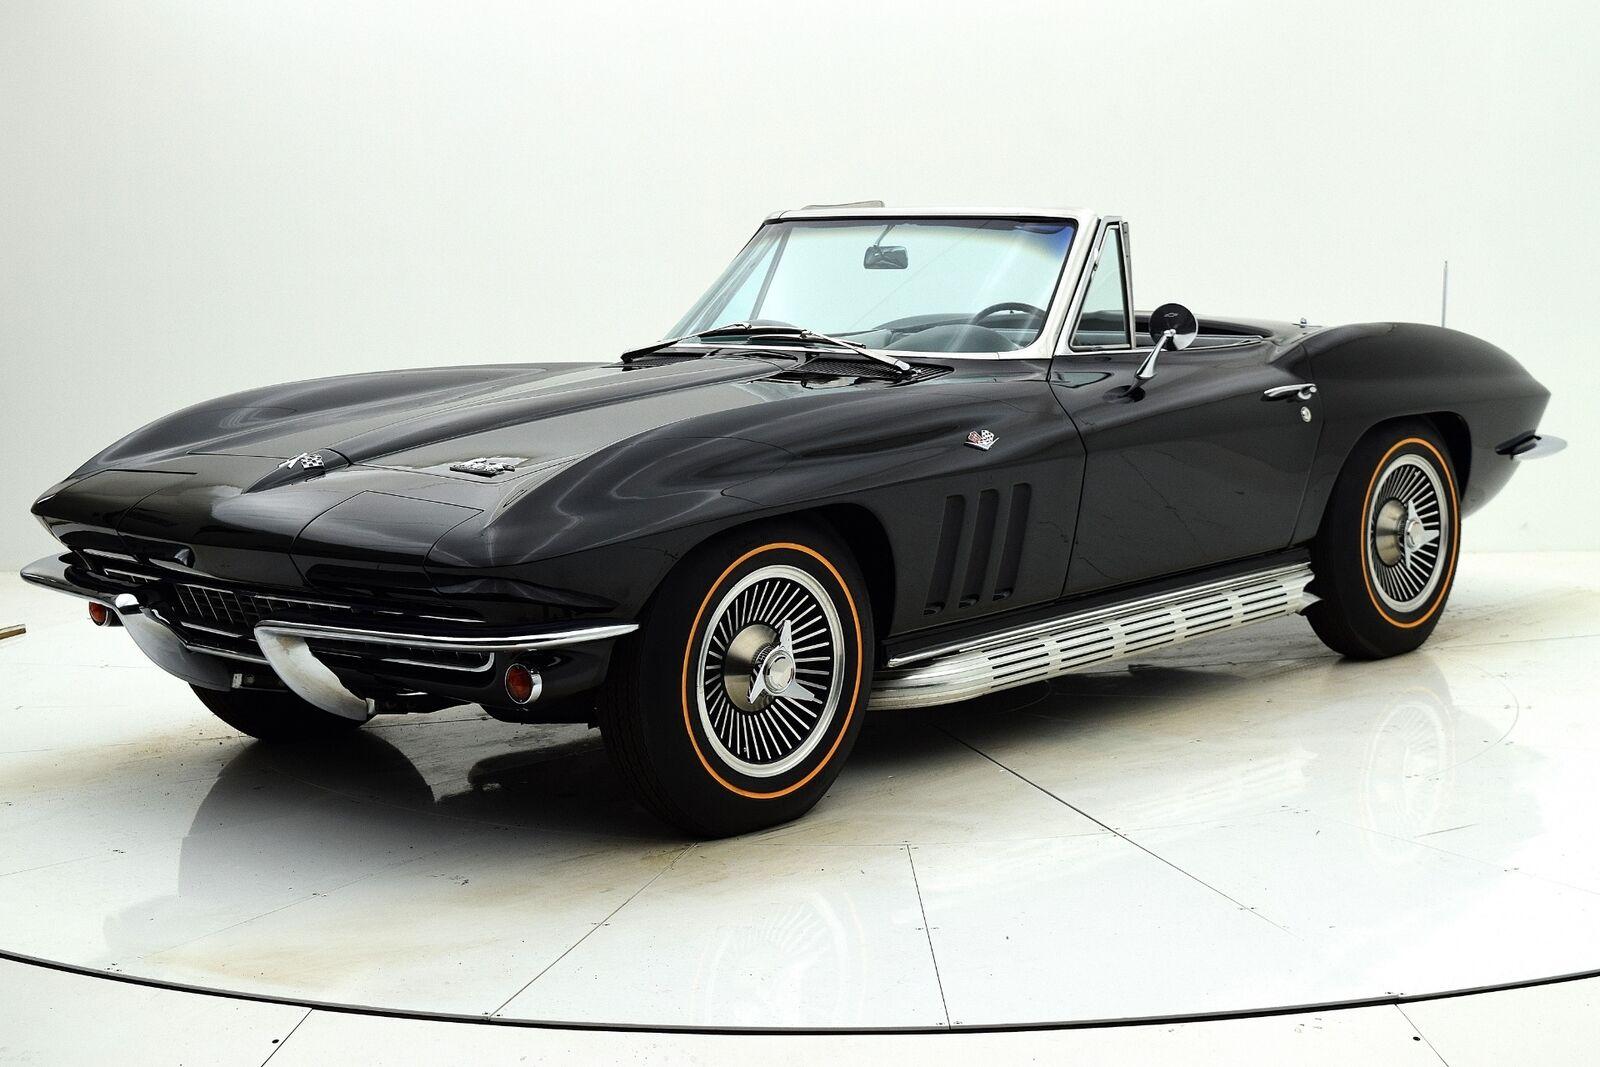 1966 Black Chevrolet Corvette Convertible  | C2 Corvette Photo 10